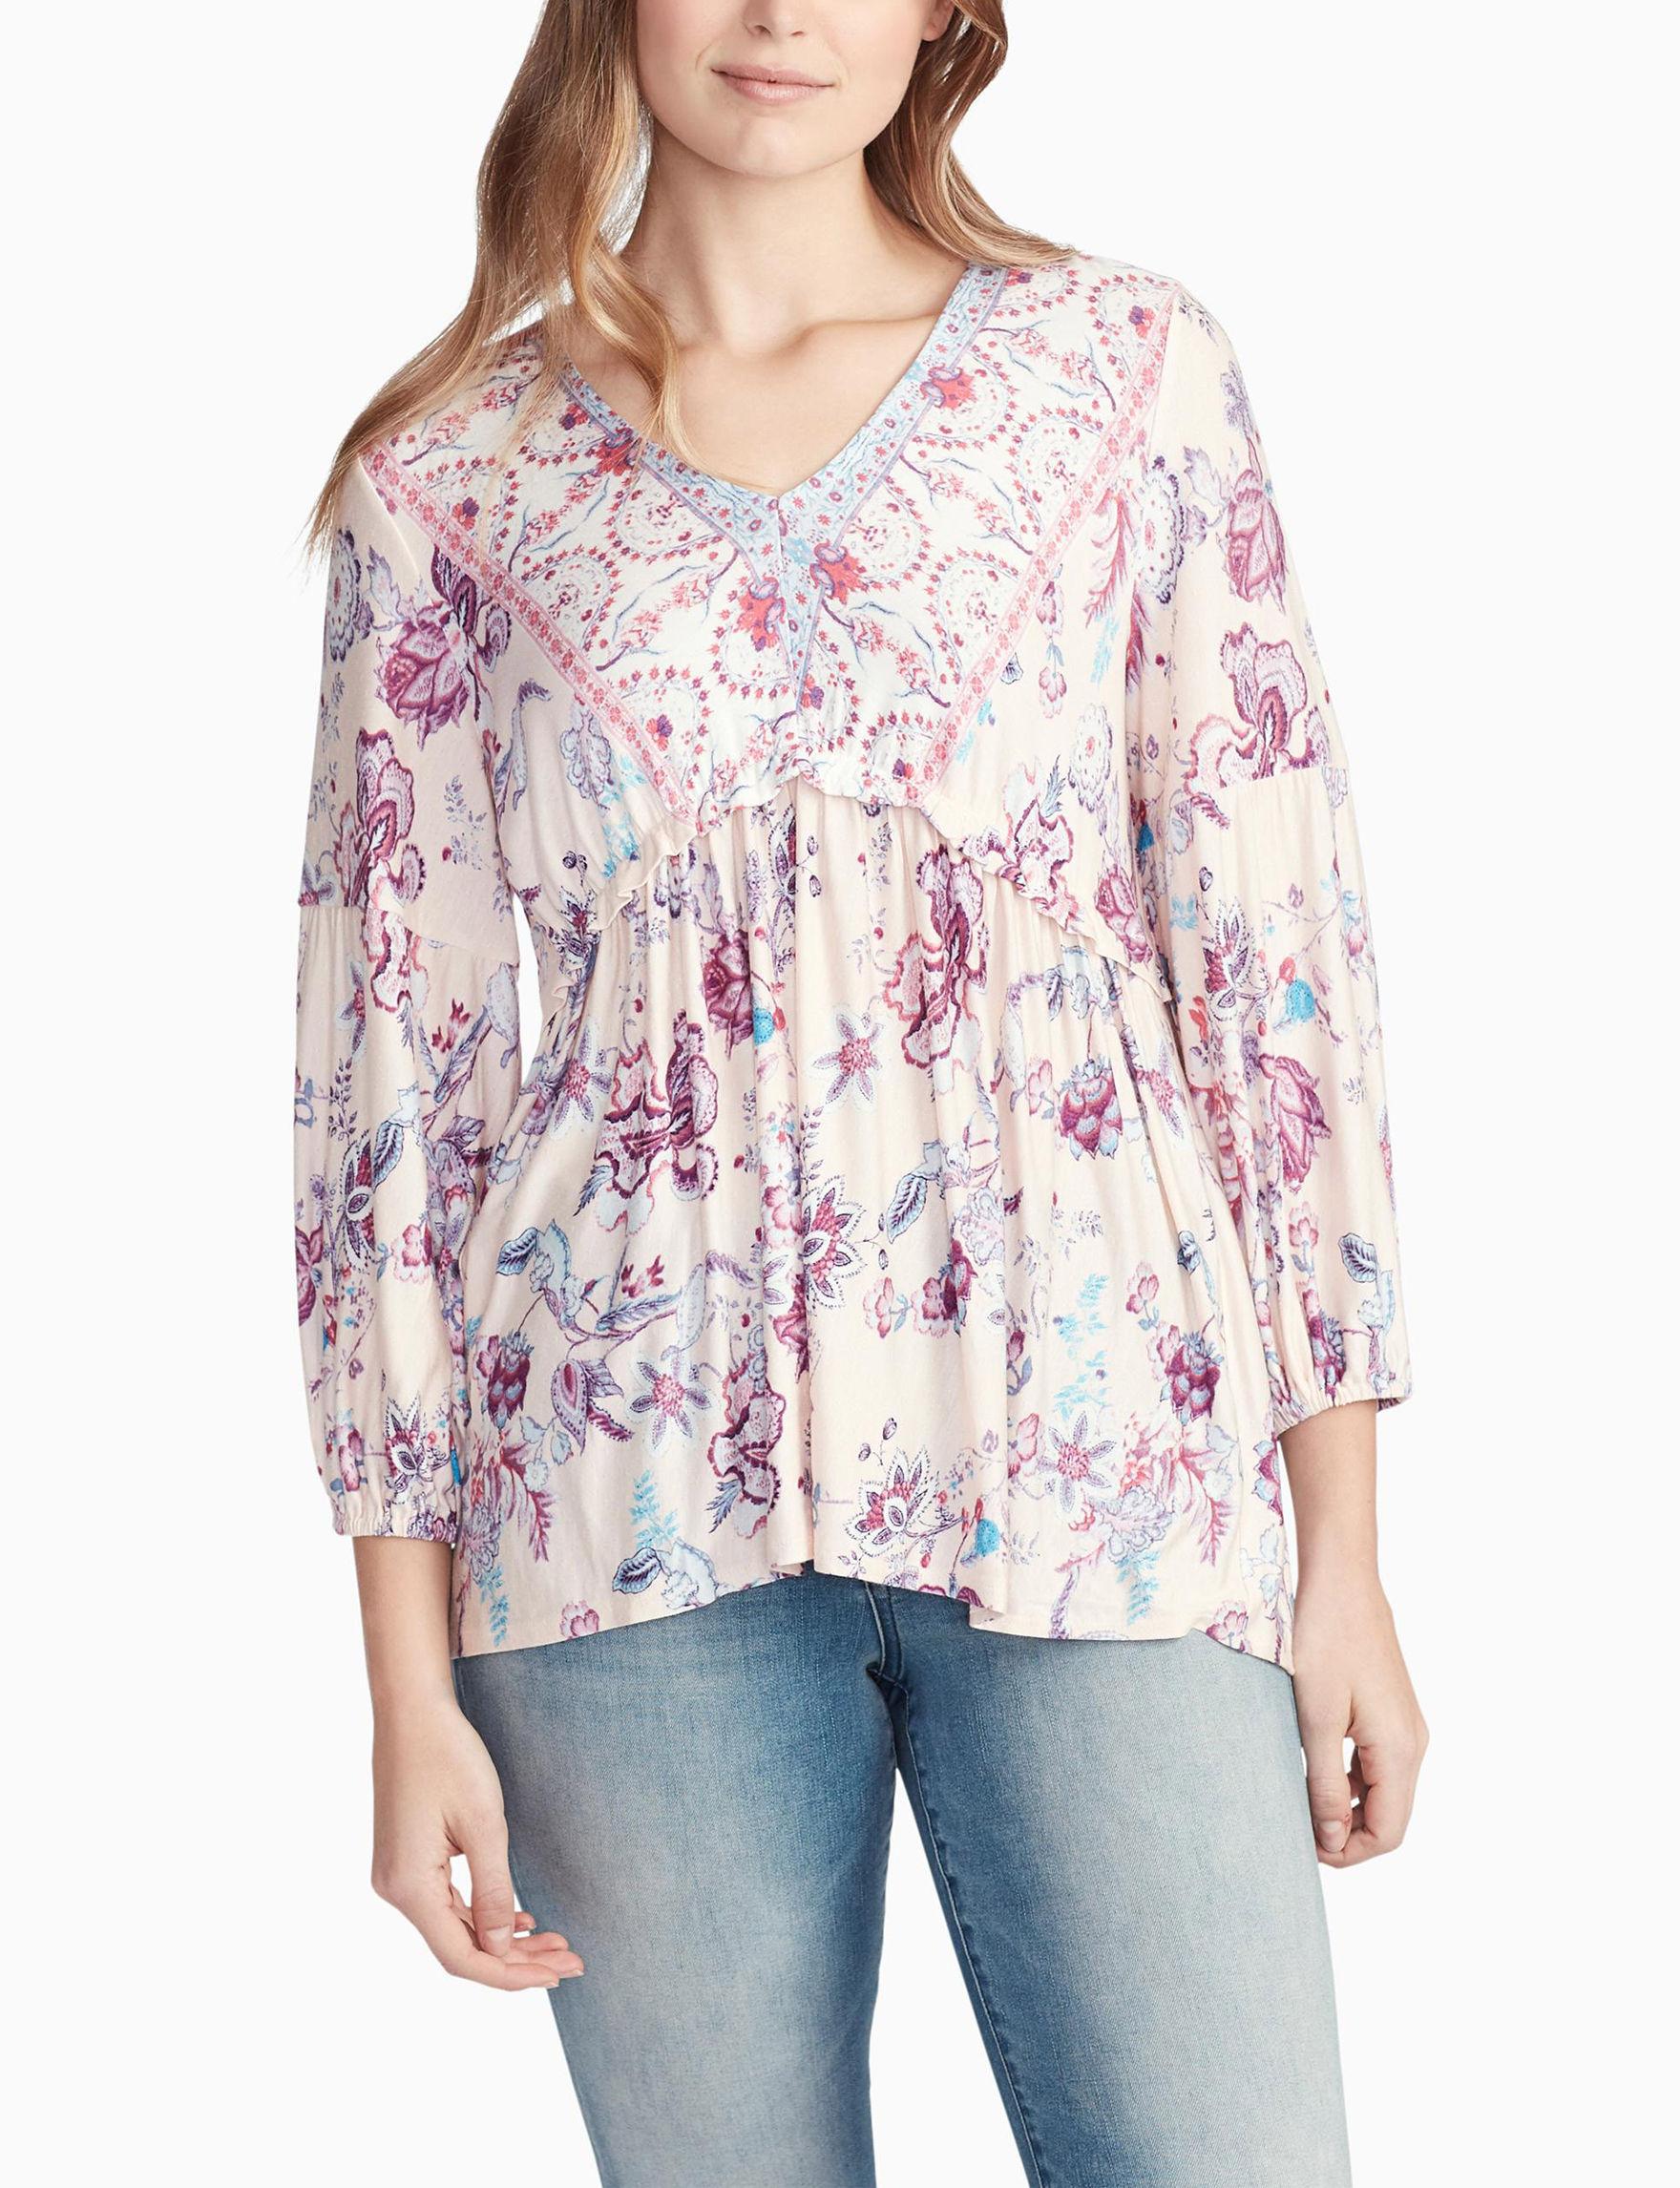 Vintage America Blues Pink Floral Shirts & Blouses